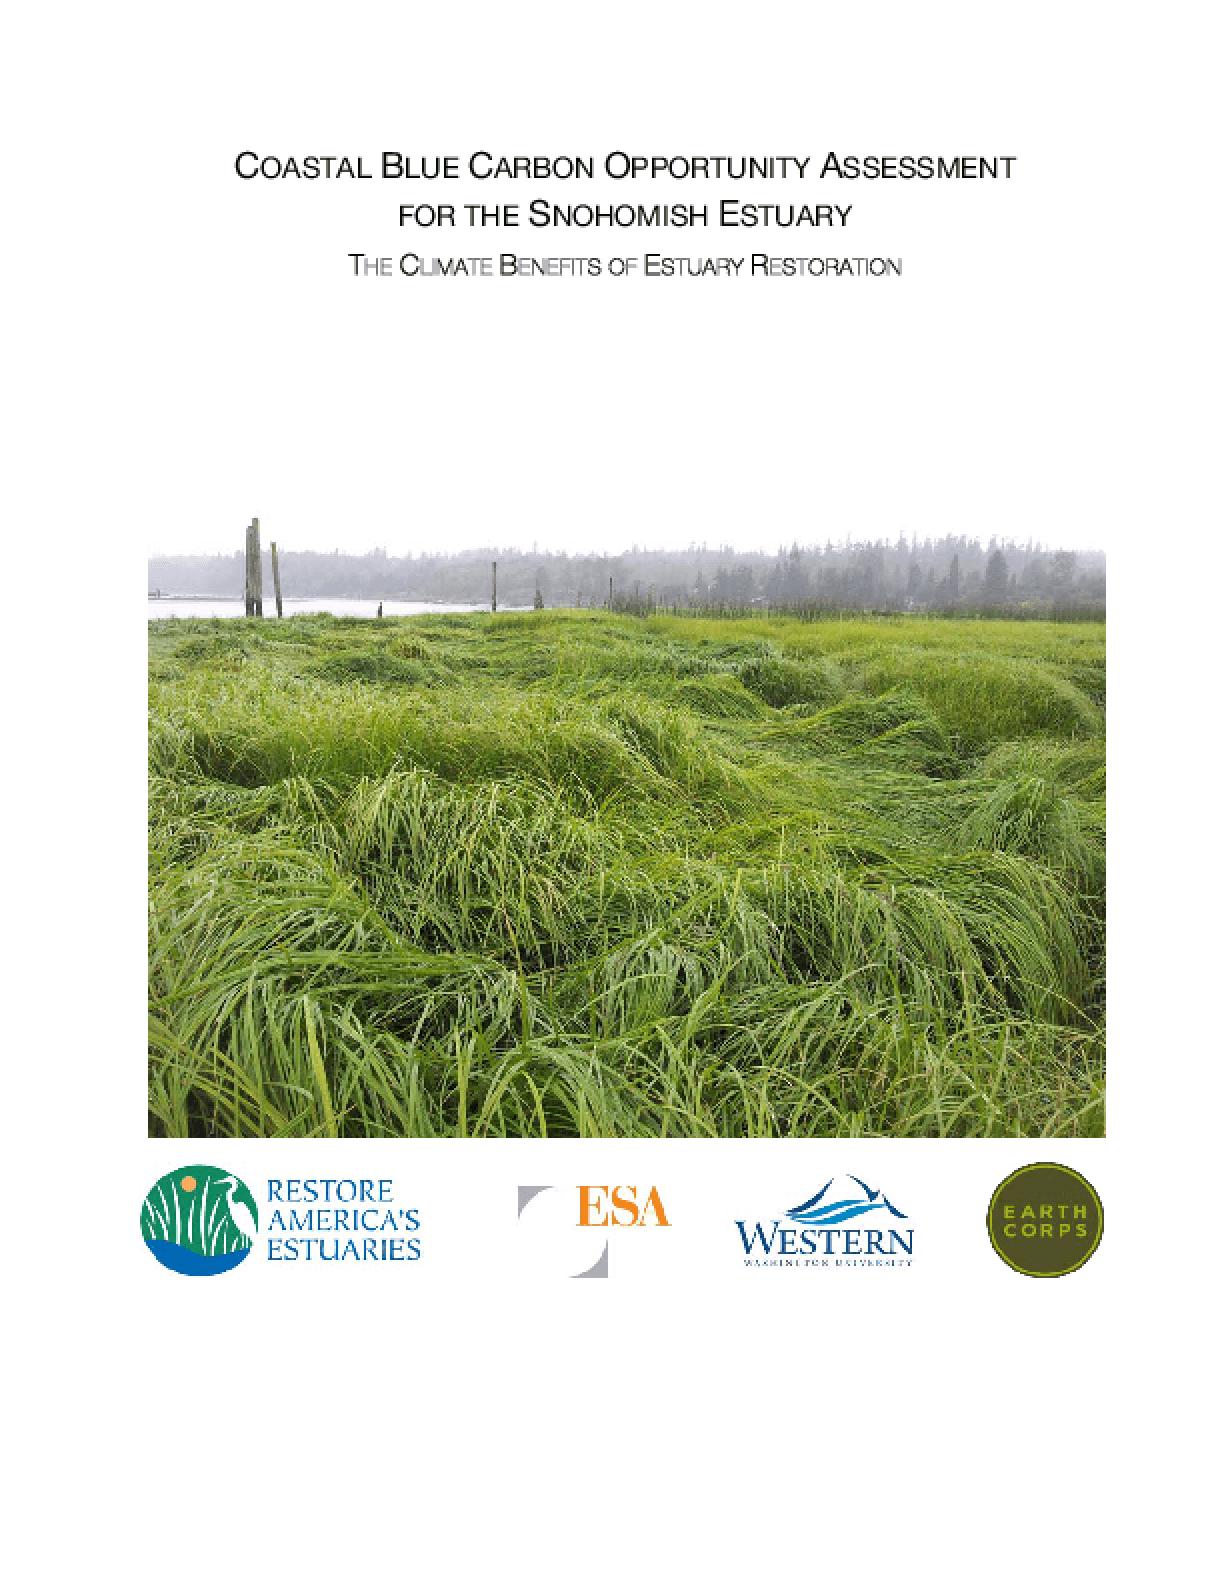 Coastal Blue Carbon Opportunity Assessment for Snohomish Estuary: The Climate Benefits of Estuary Restoration